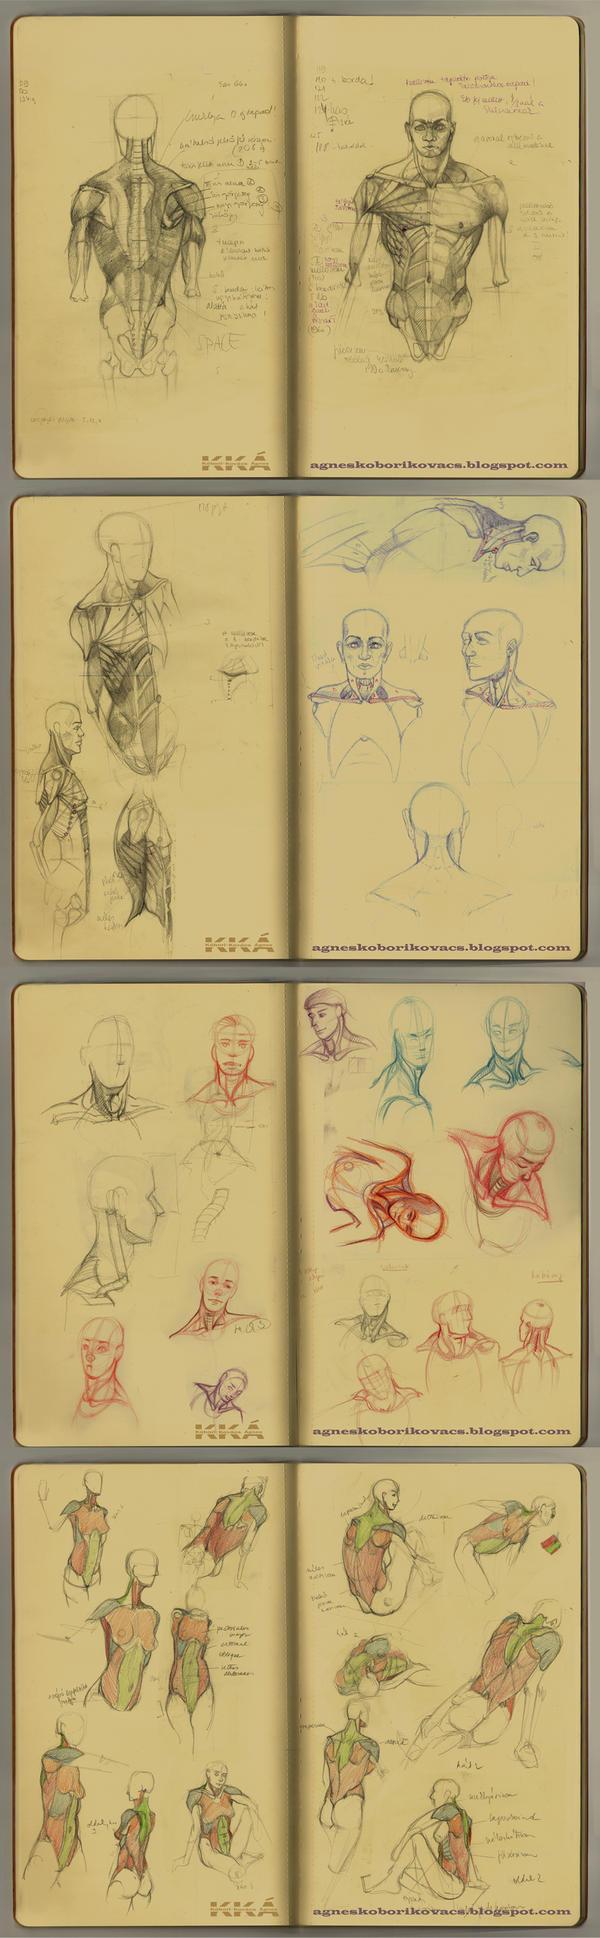 Upper body anatomy -  guide by Valandil0